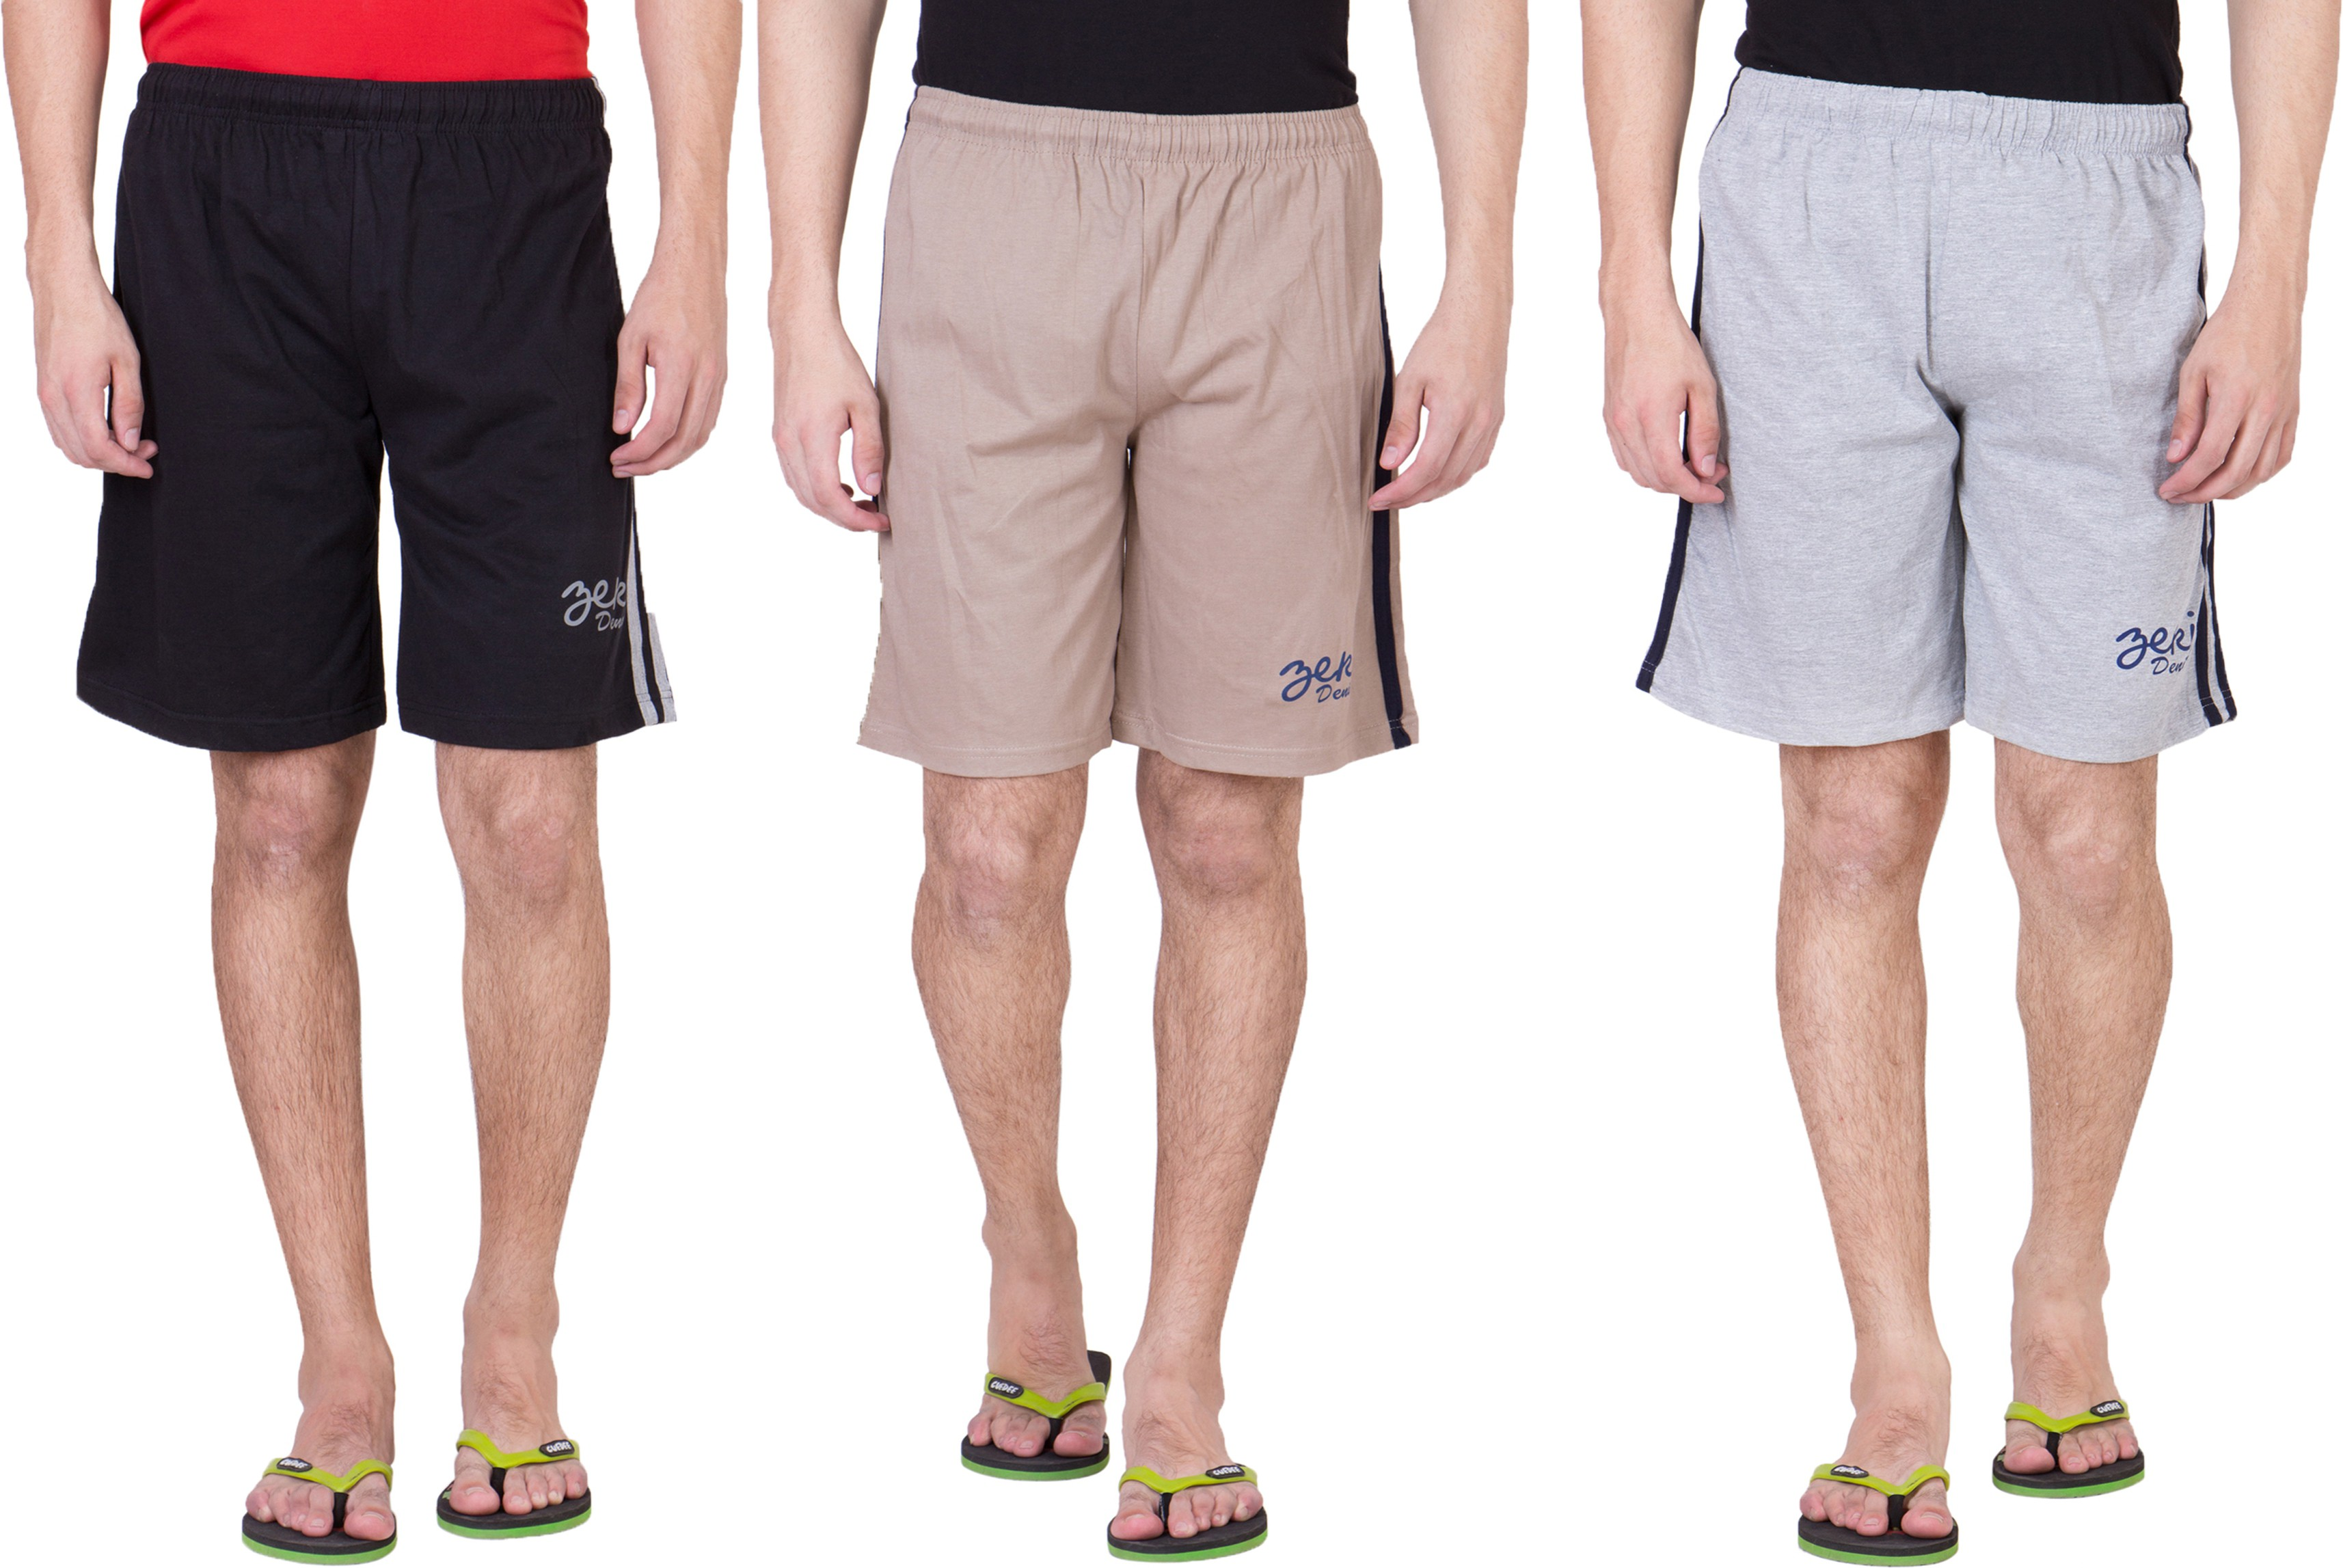 Deals | Gant, IZOD, Maniac... Shorts, Cargos...